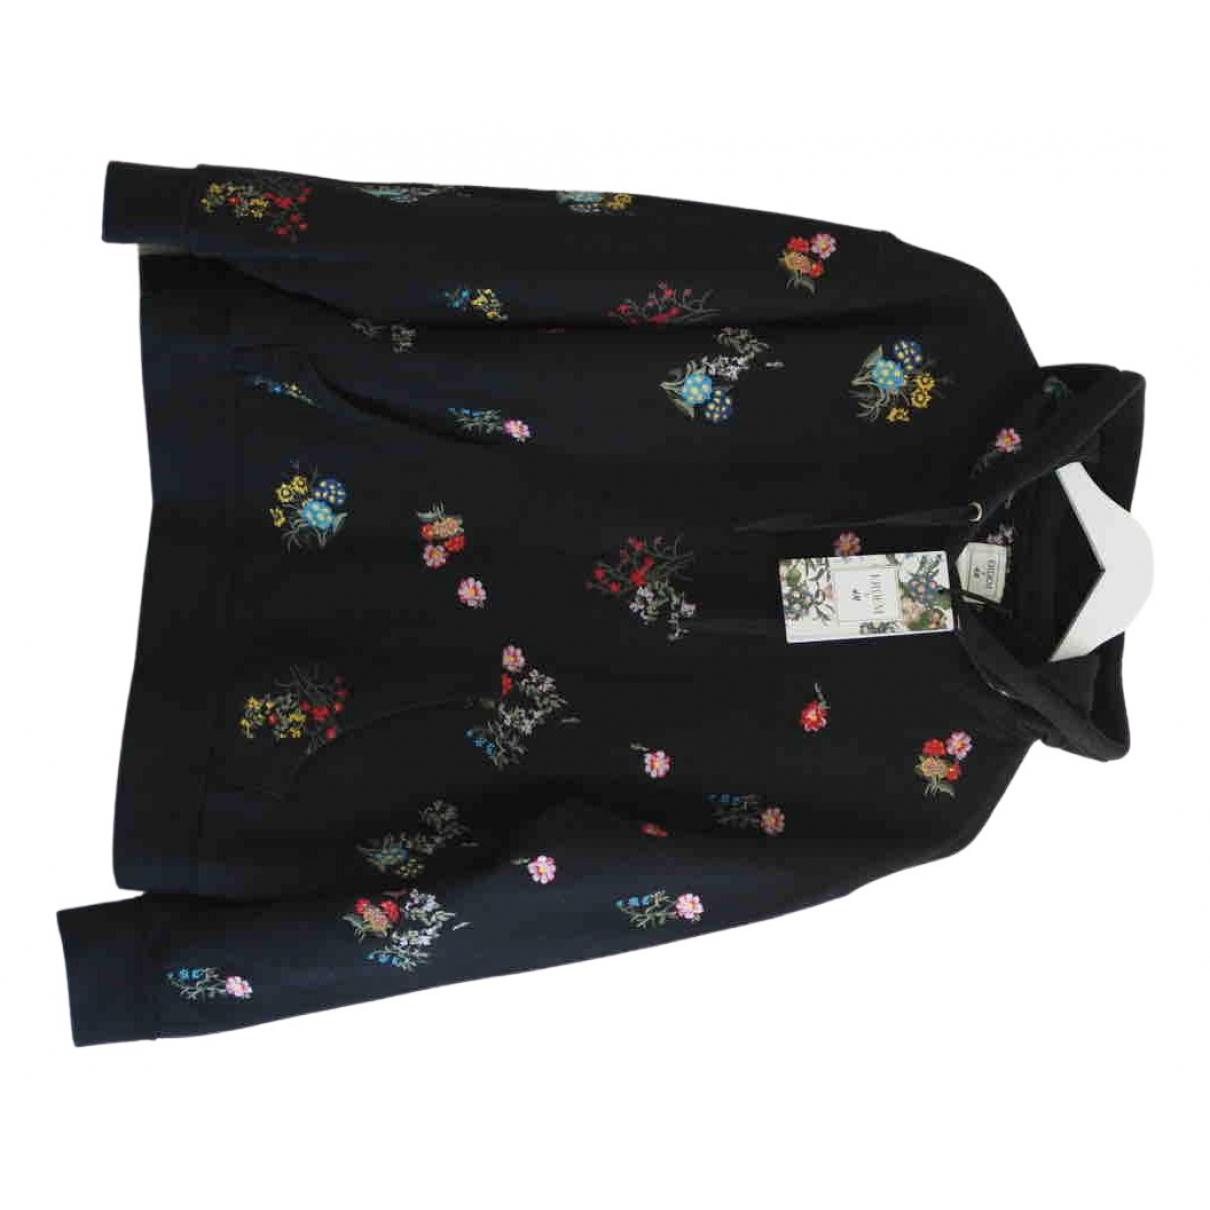 Erdem X H&m \N Black Cotton Knitwear & Sweatshirts for Men M International